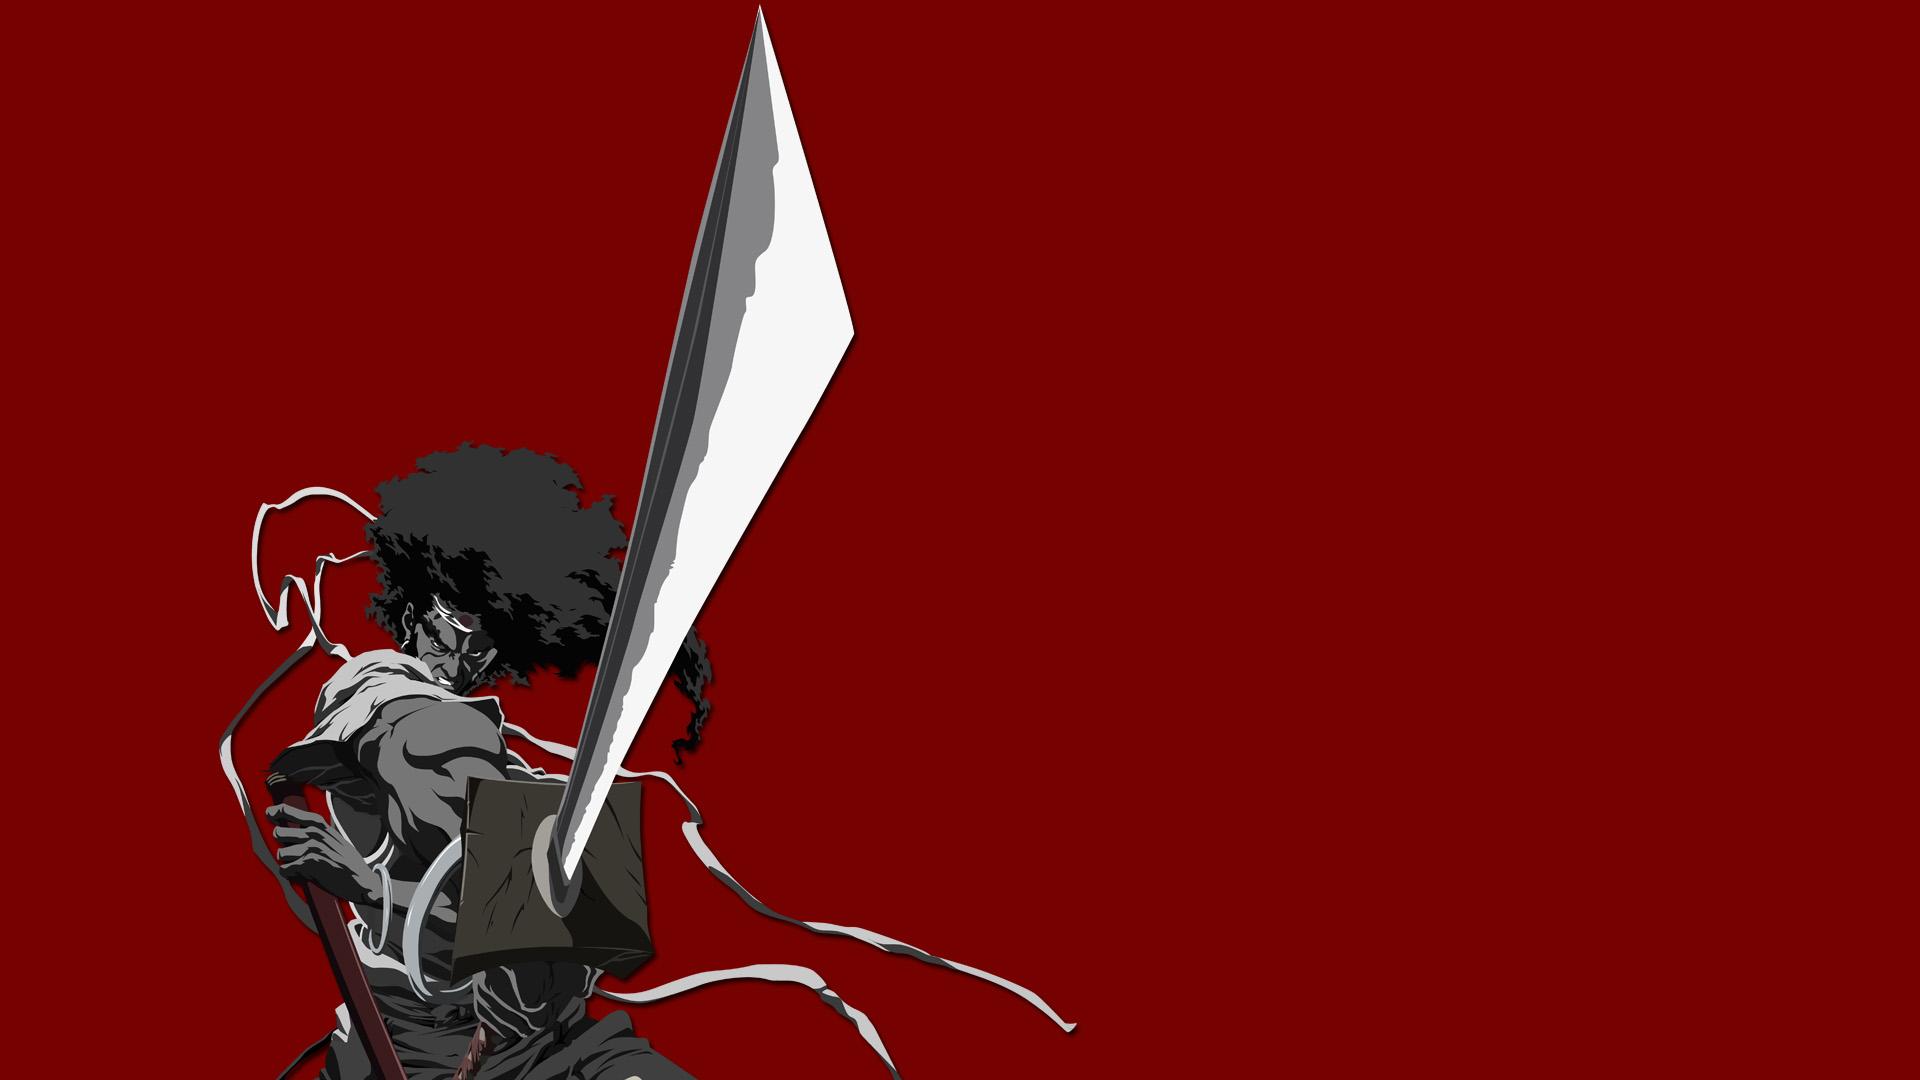 Anime Afro Samurai 1920x1080